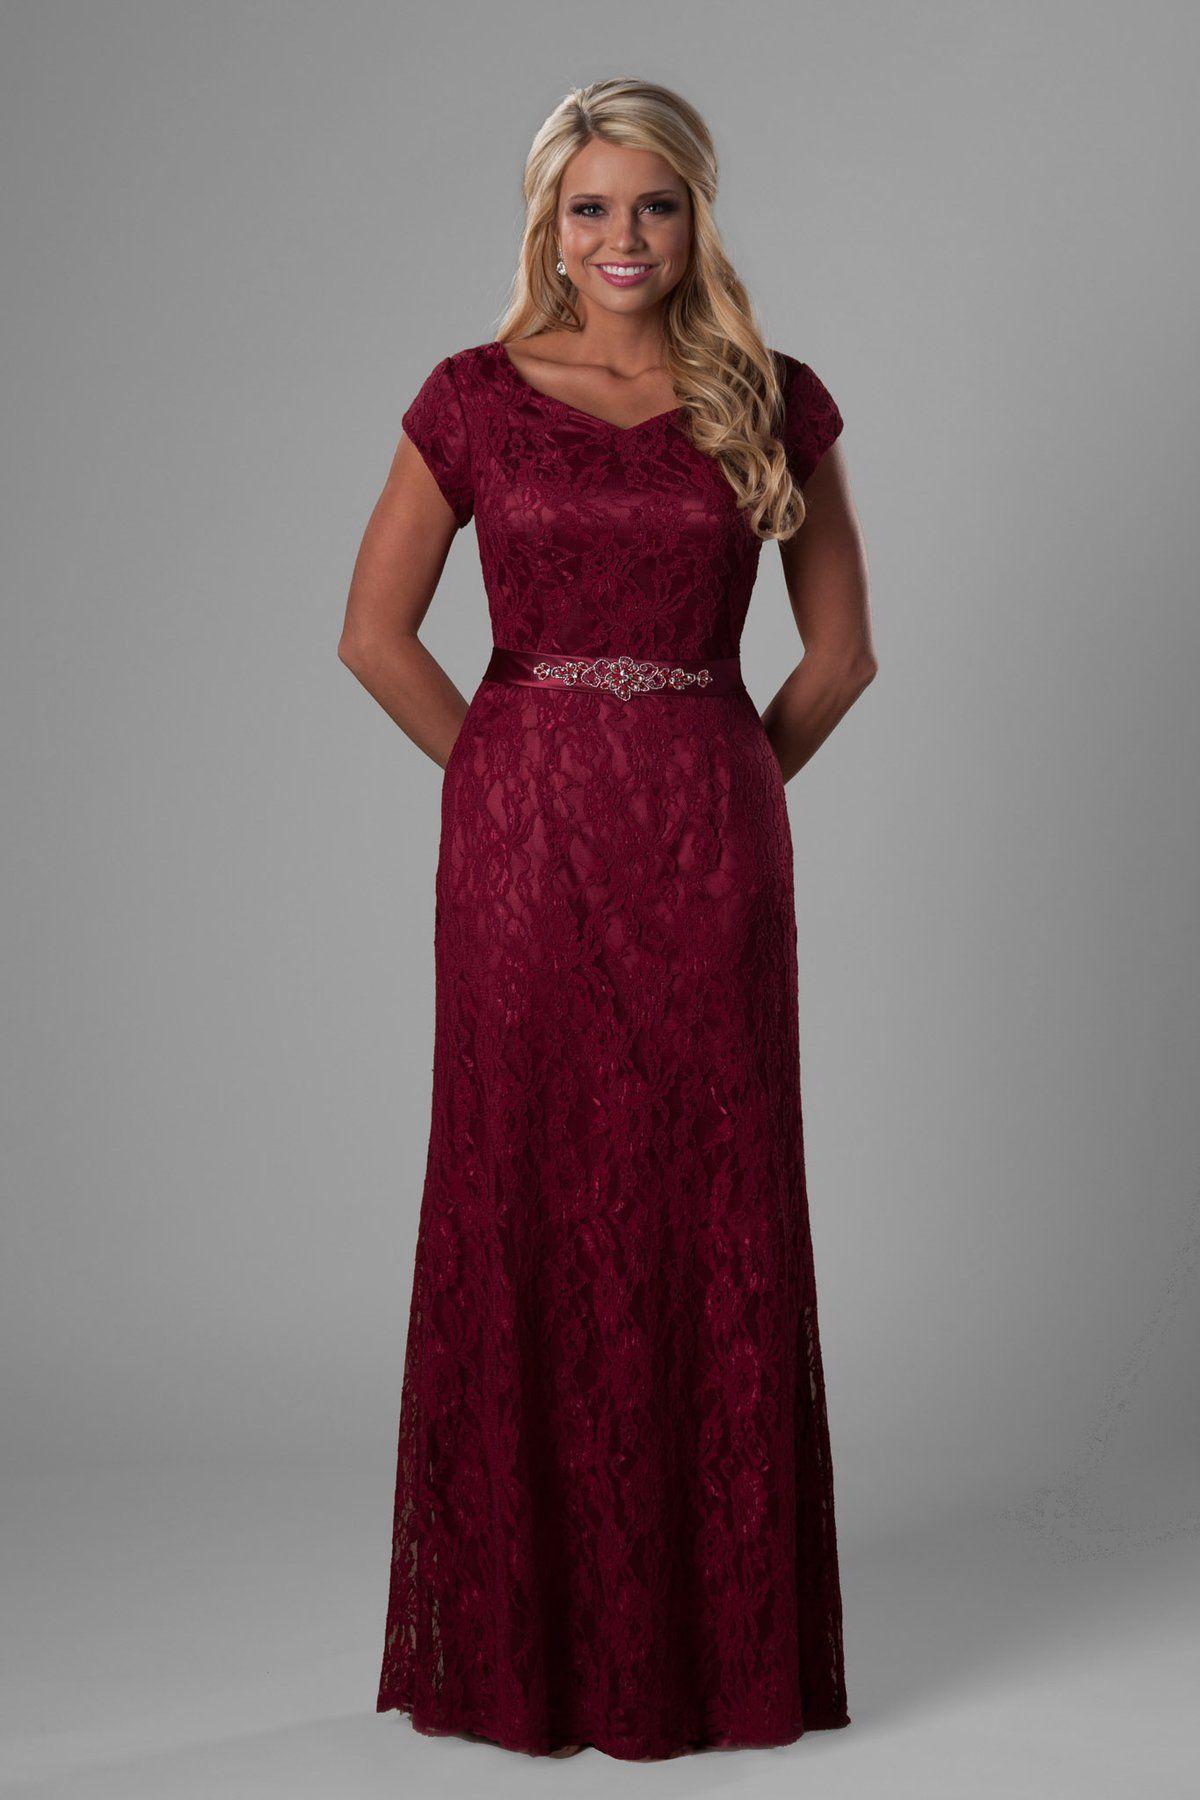 Modest bridesmaids dresses jamie latterdaybride in